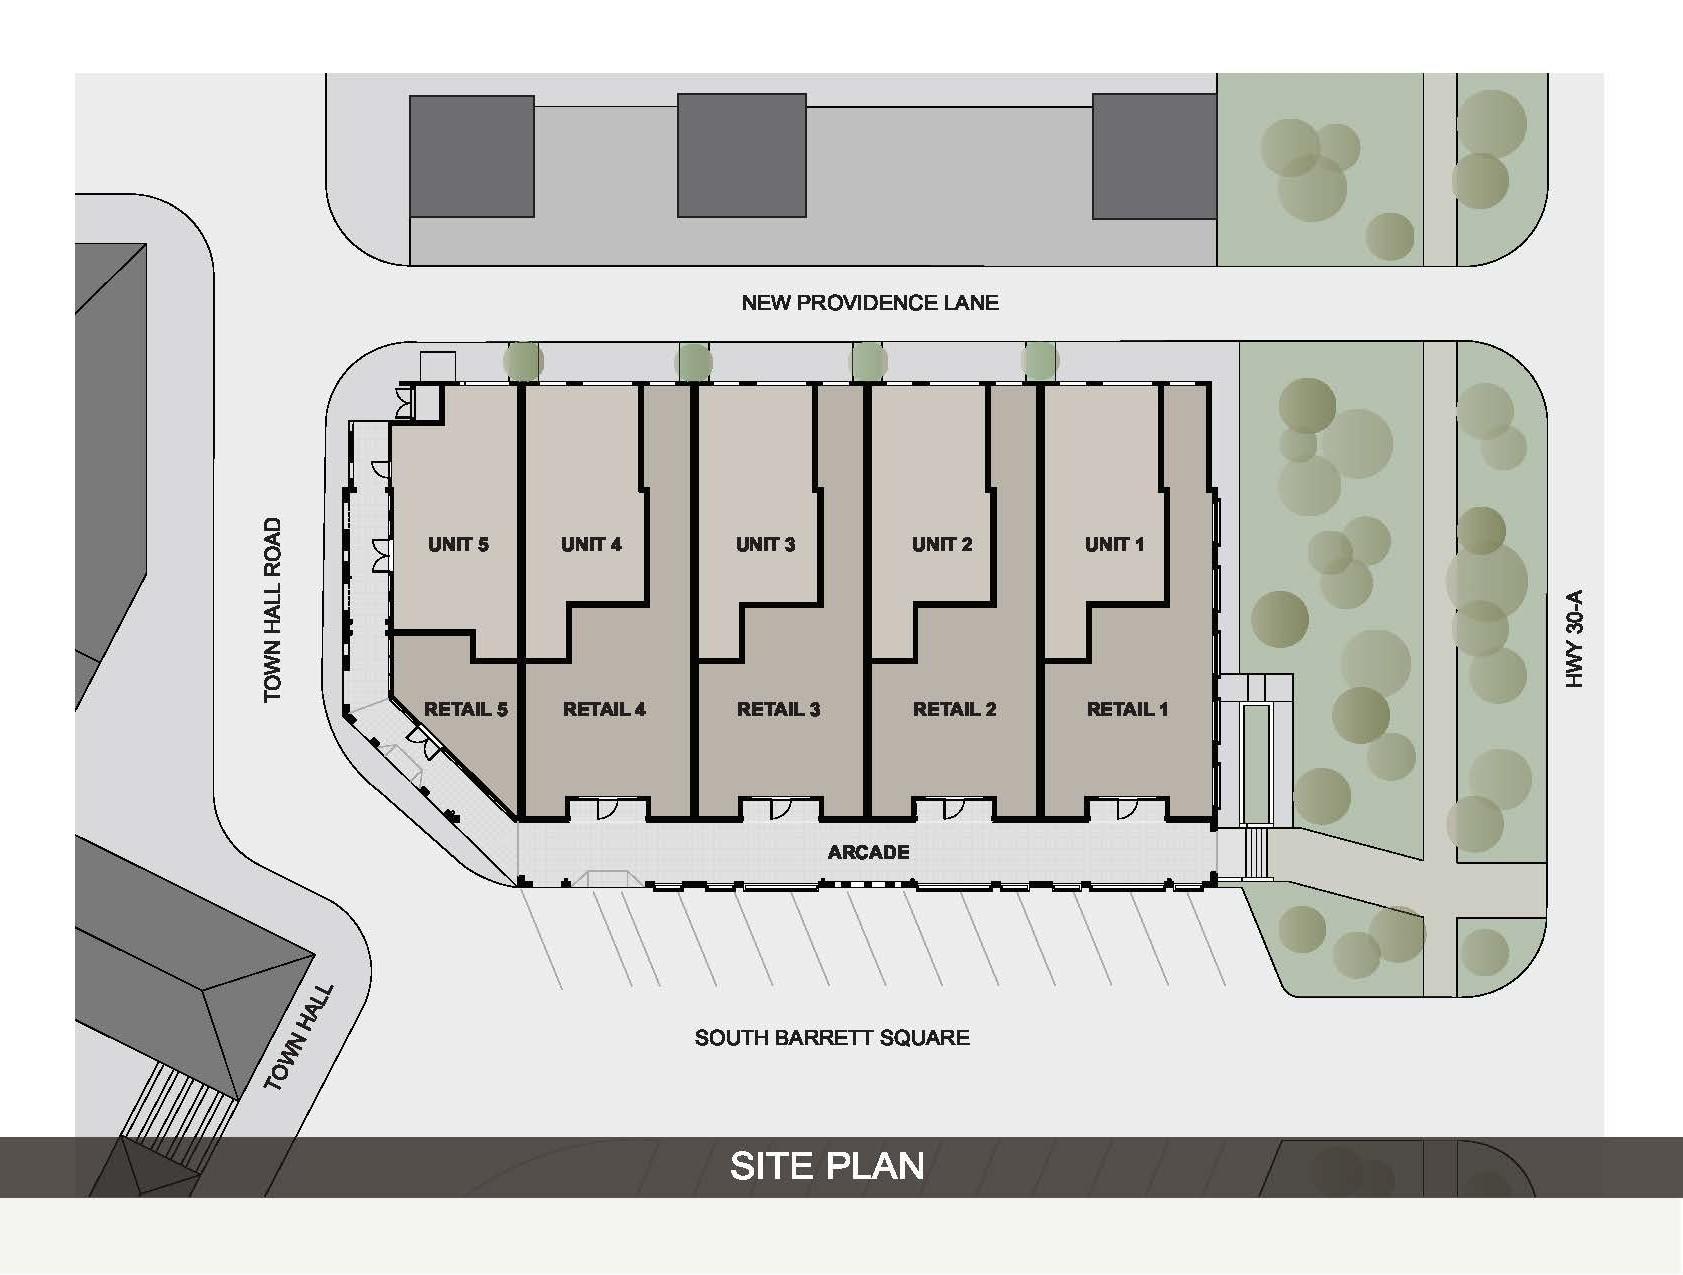 Site Plan layout